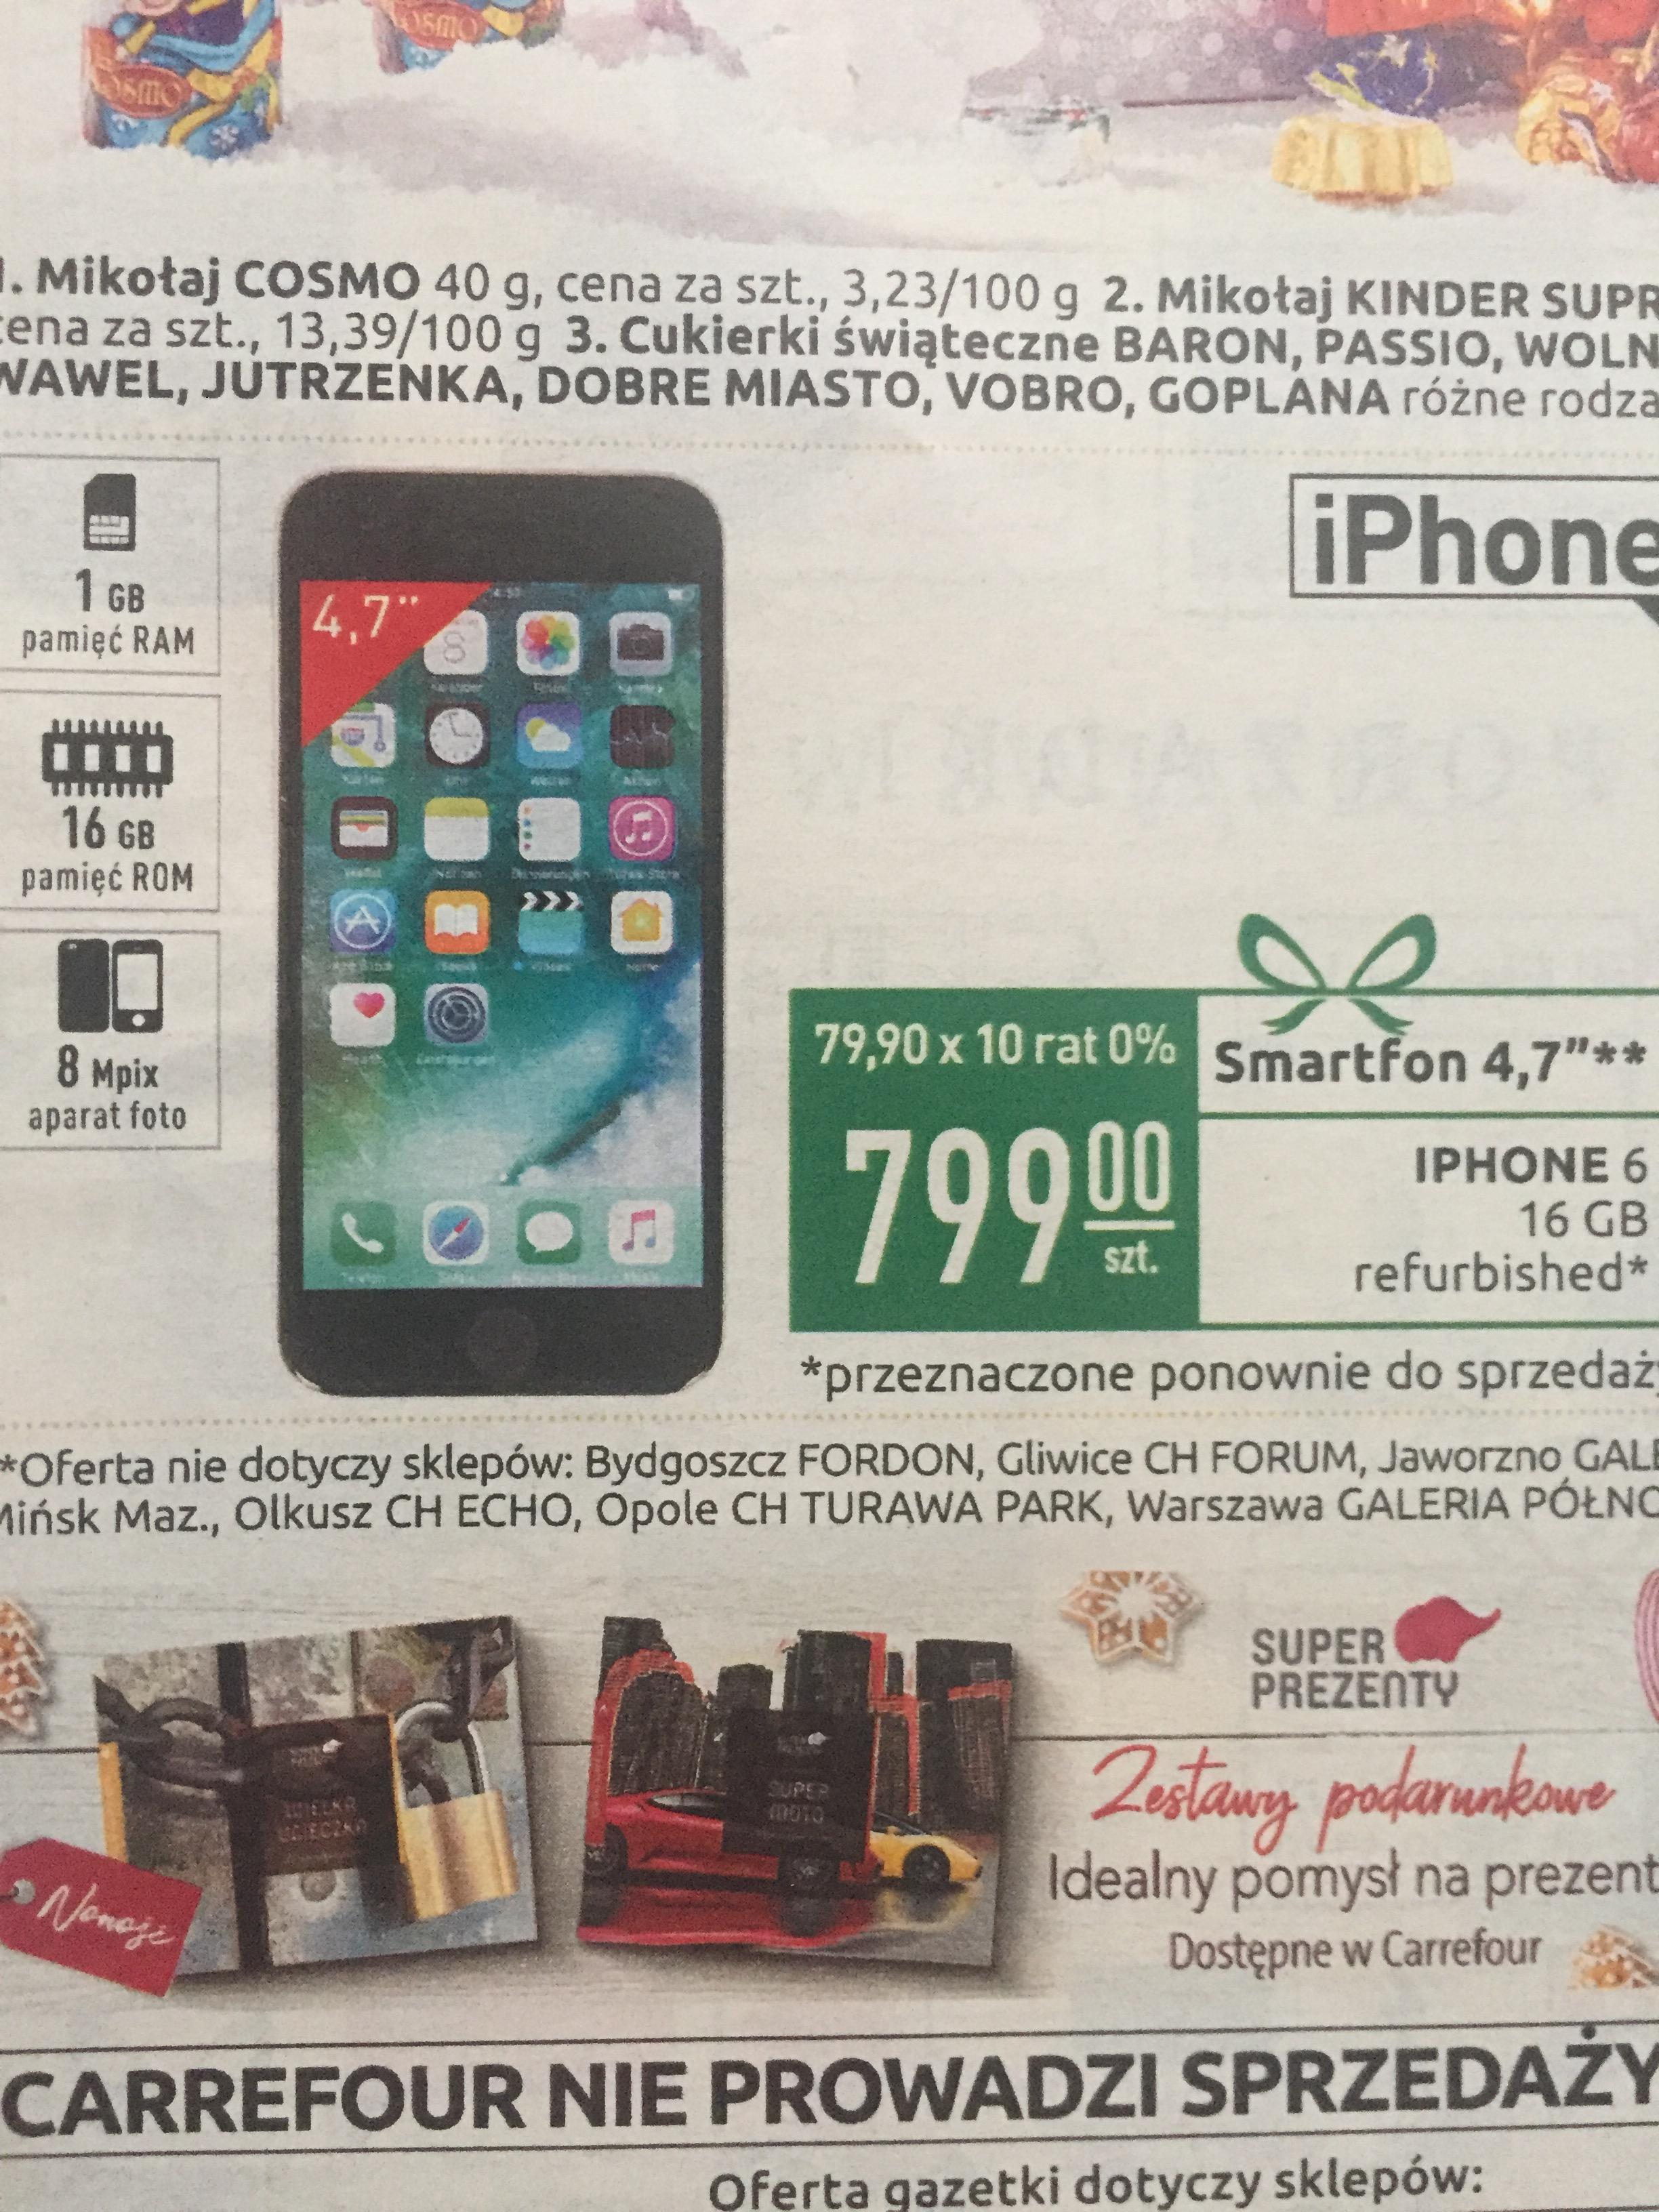 iPhone 6 16gb odnowiony @carrefour